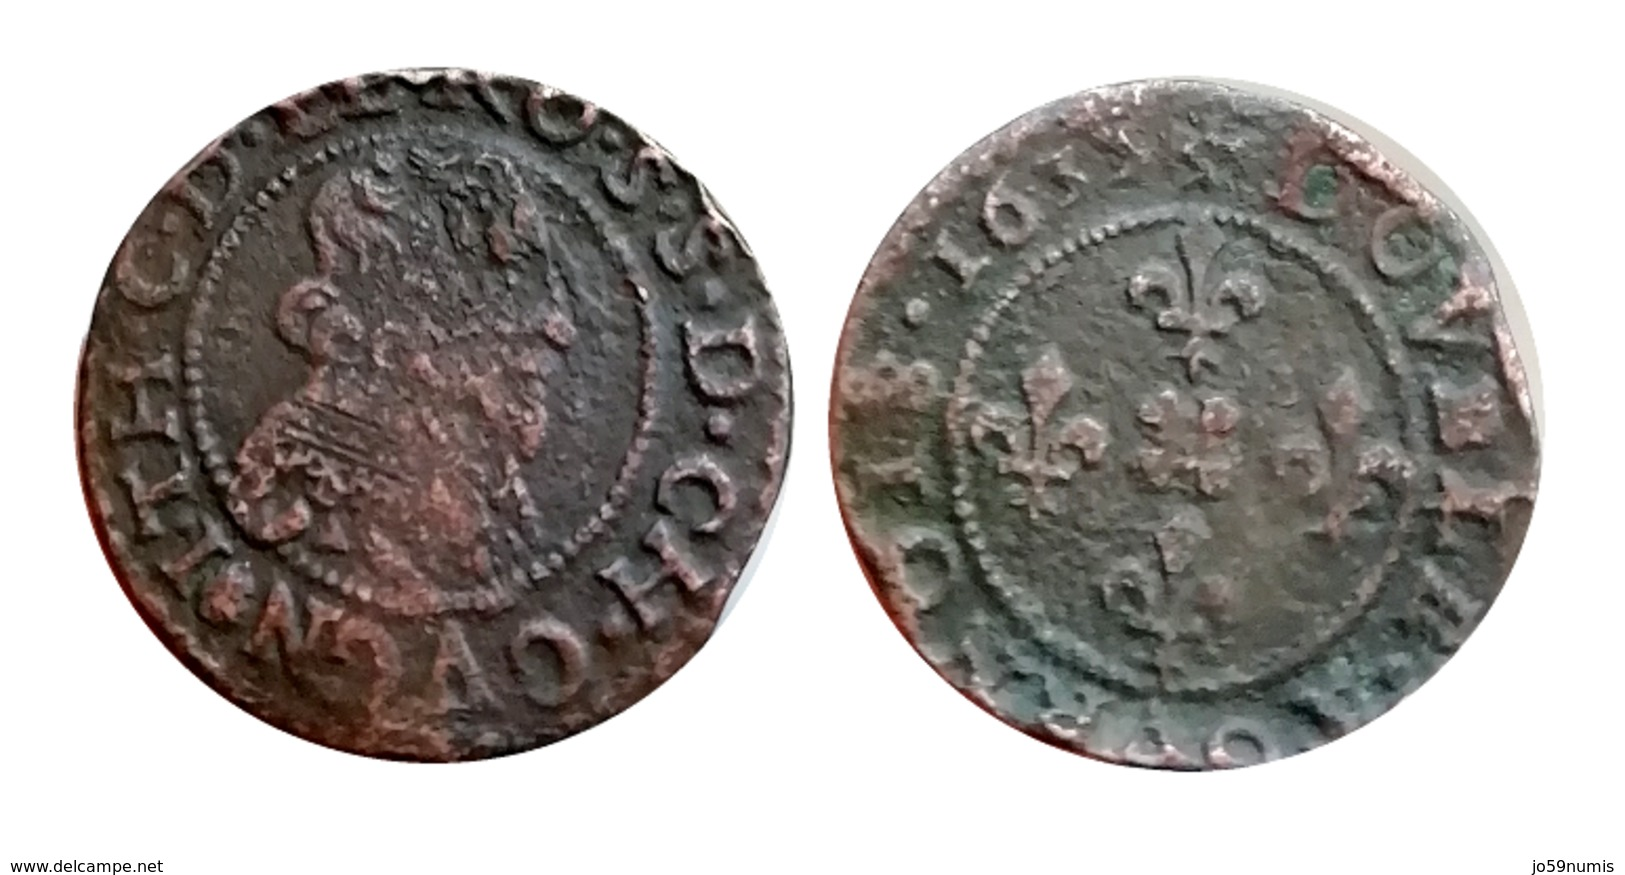 RARE!!! JEAN-THEODORE Double Tournois (Cugnon) 1633 CGKL R2 A VOIR!!! - 476-1789 Monnaies Seigneuriales